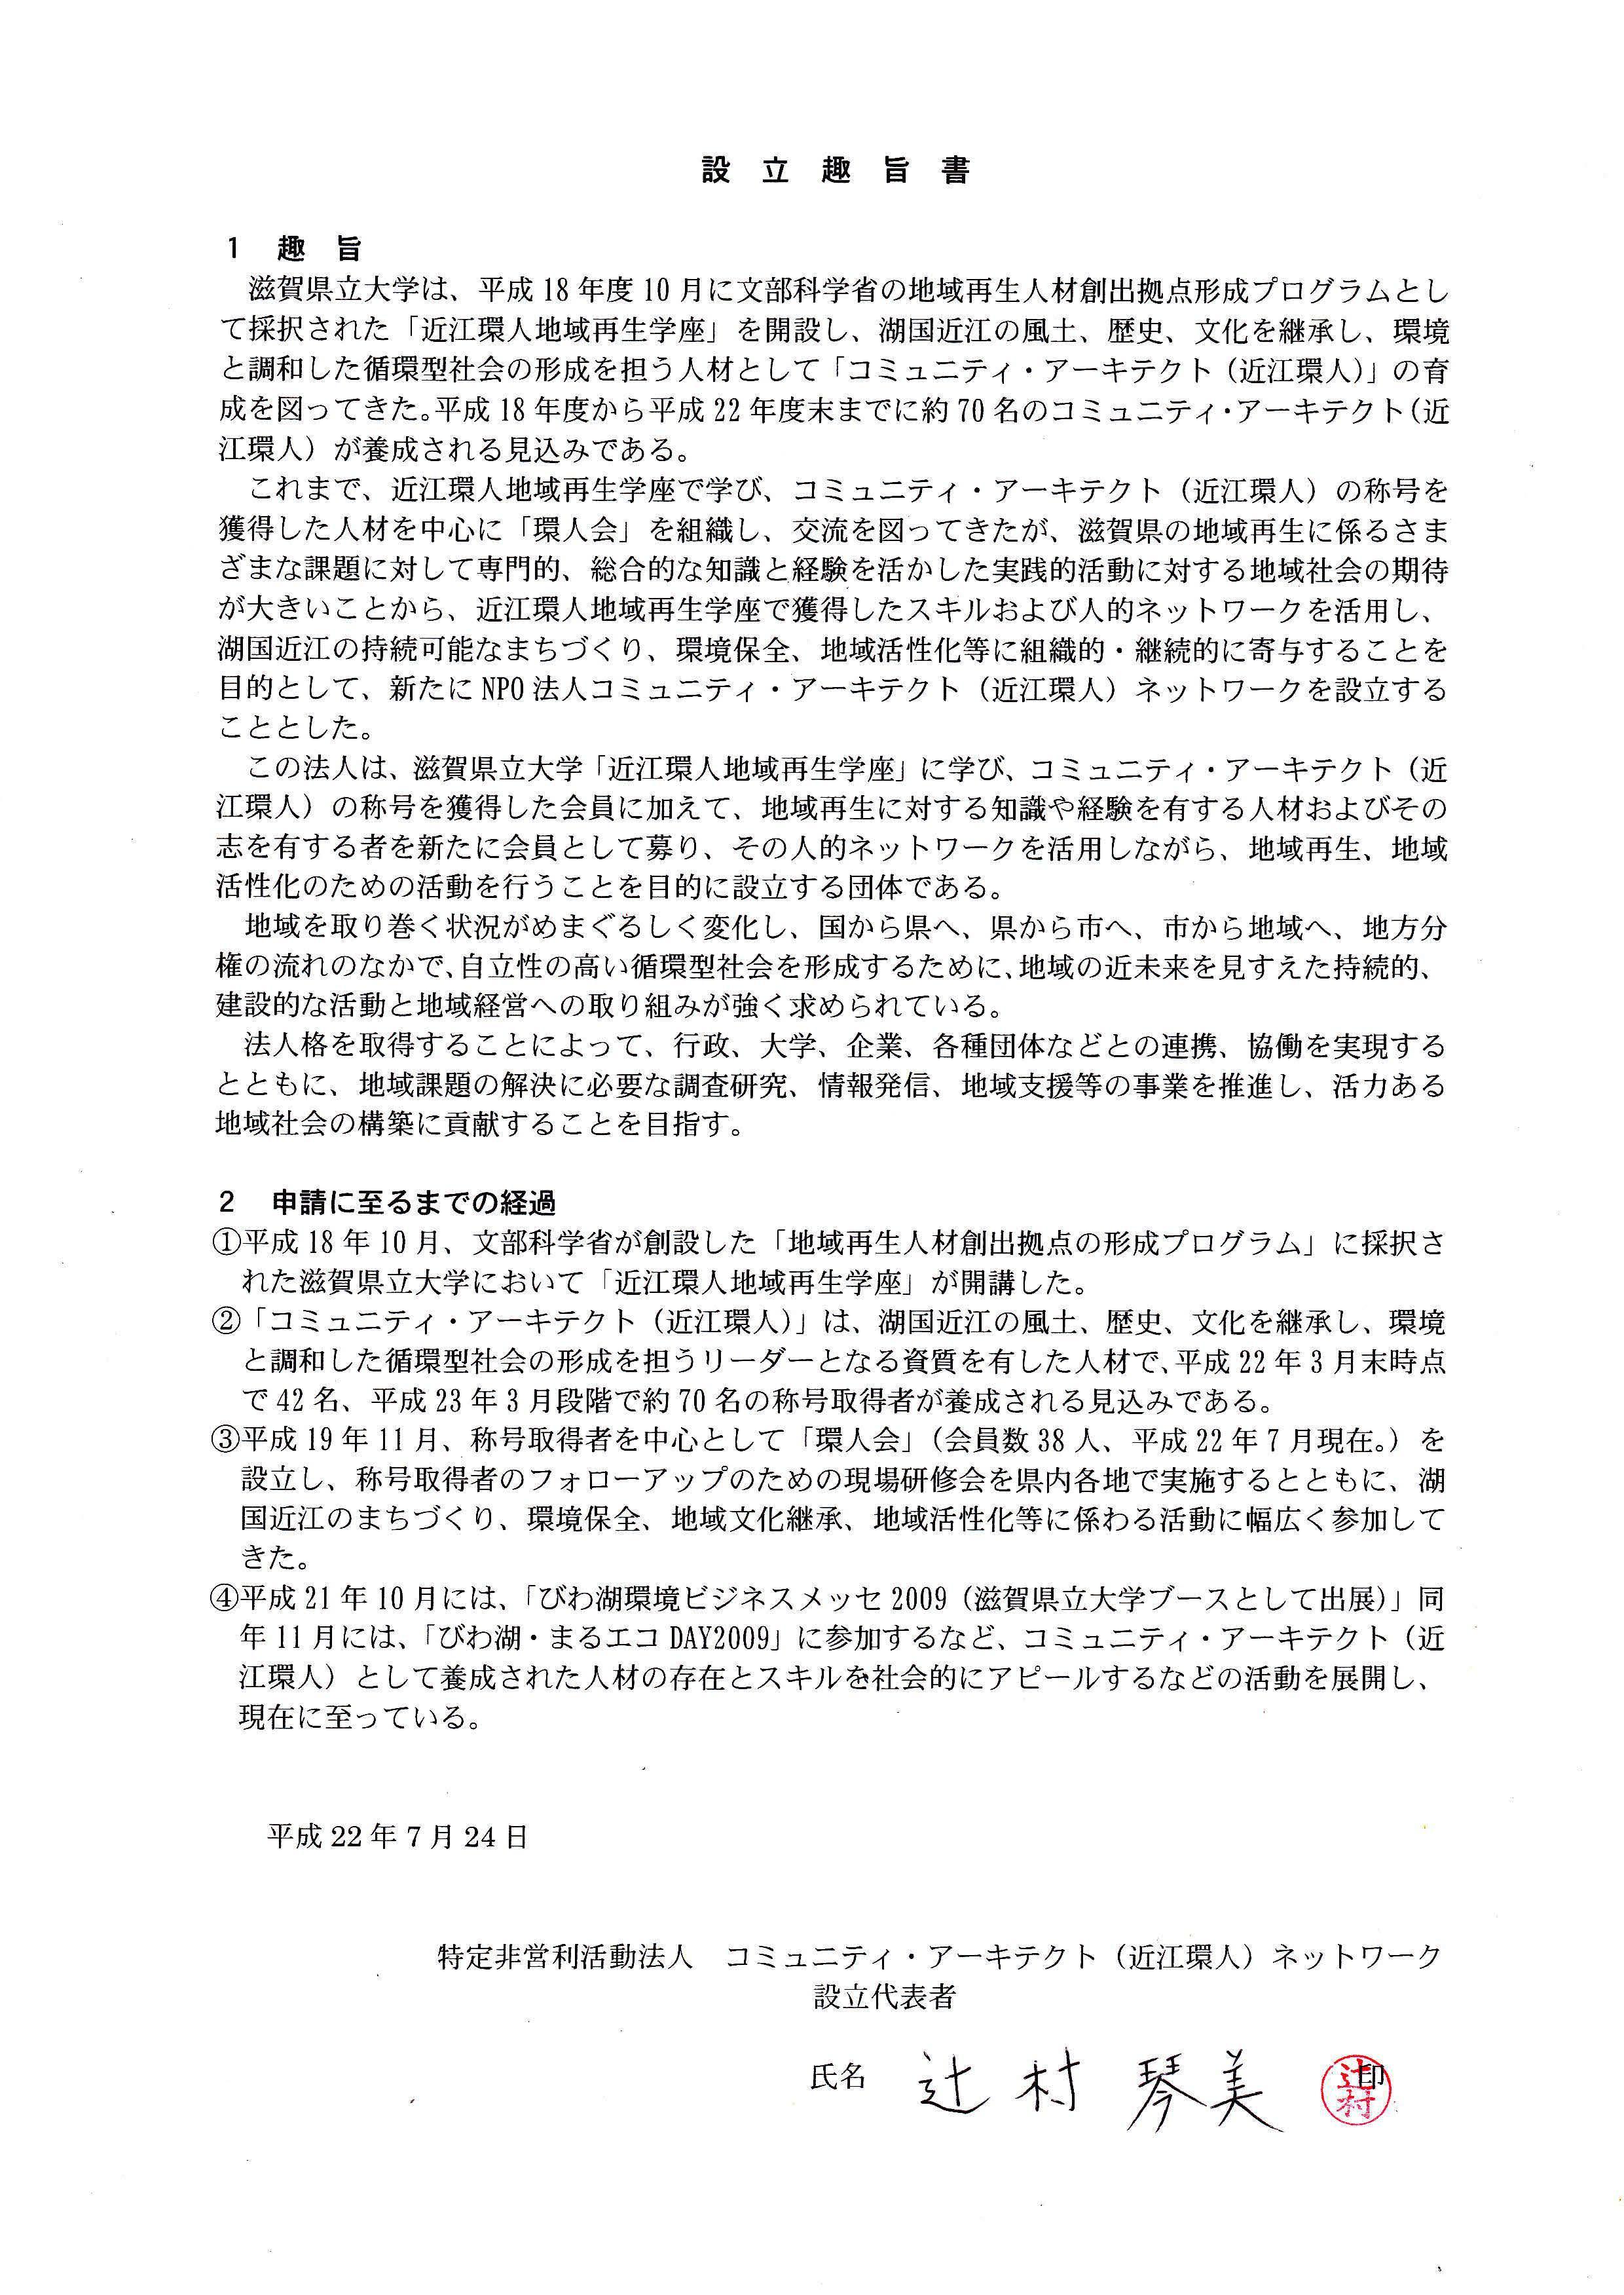 kanjin_syusisyo